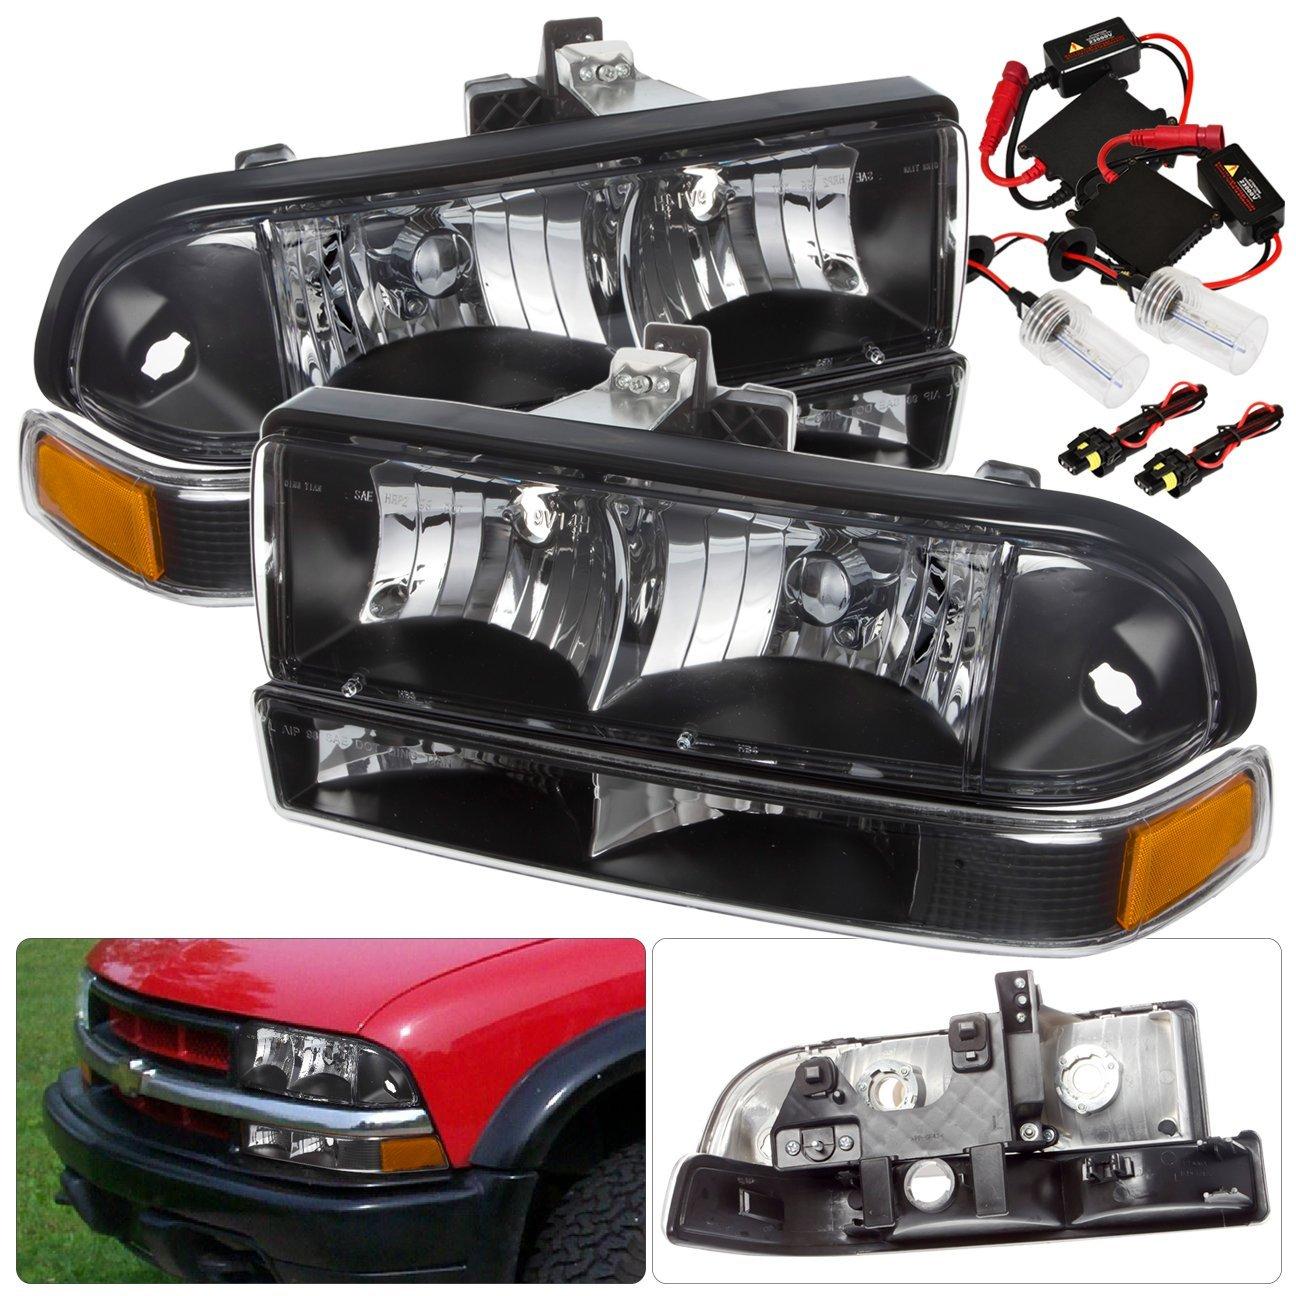 Black DRIVER SIDE SUV 1999 99 2000 00 2001 01 2002 02 2003 03 2004 04 W//O Dimmer 99-04 CHEVY CHEVROLET BLAZER S10 s-10 MIRROR LH Power GM49EL 15757186 Kool Vue Textured Heated